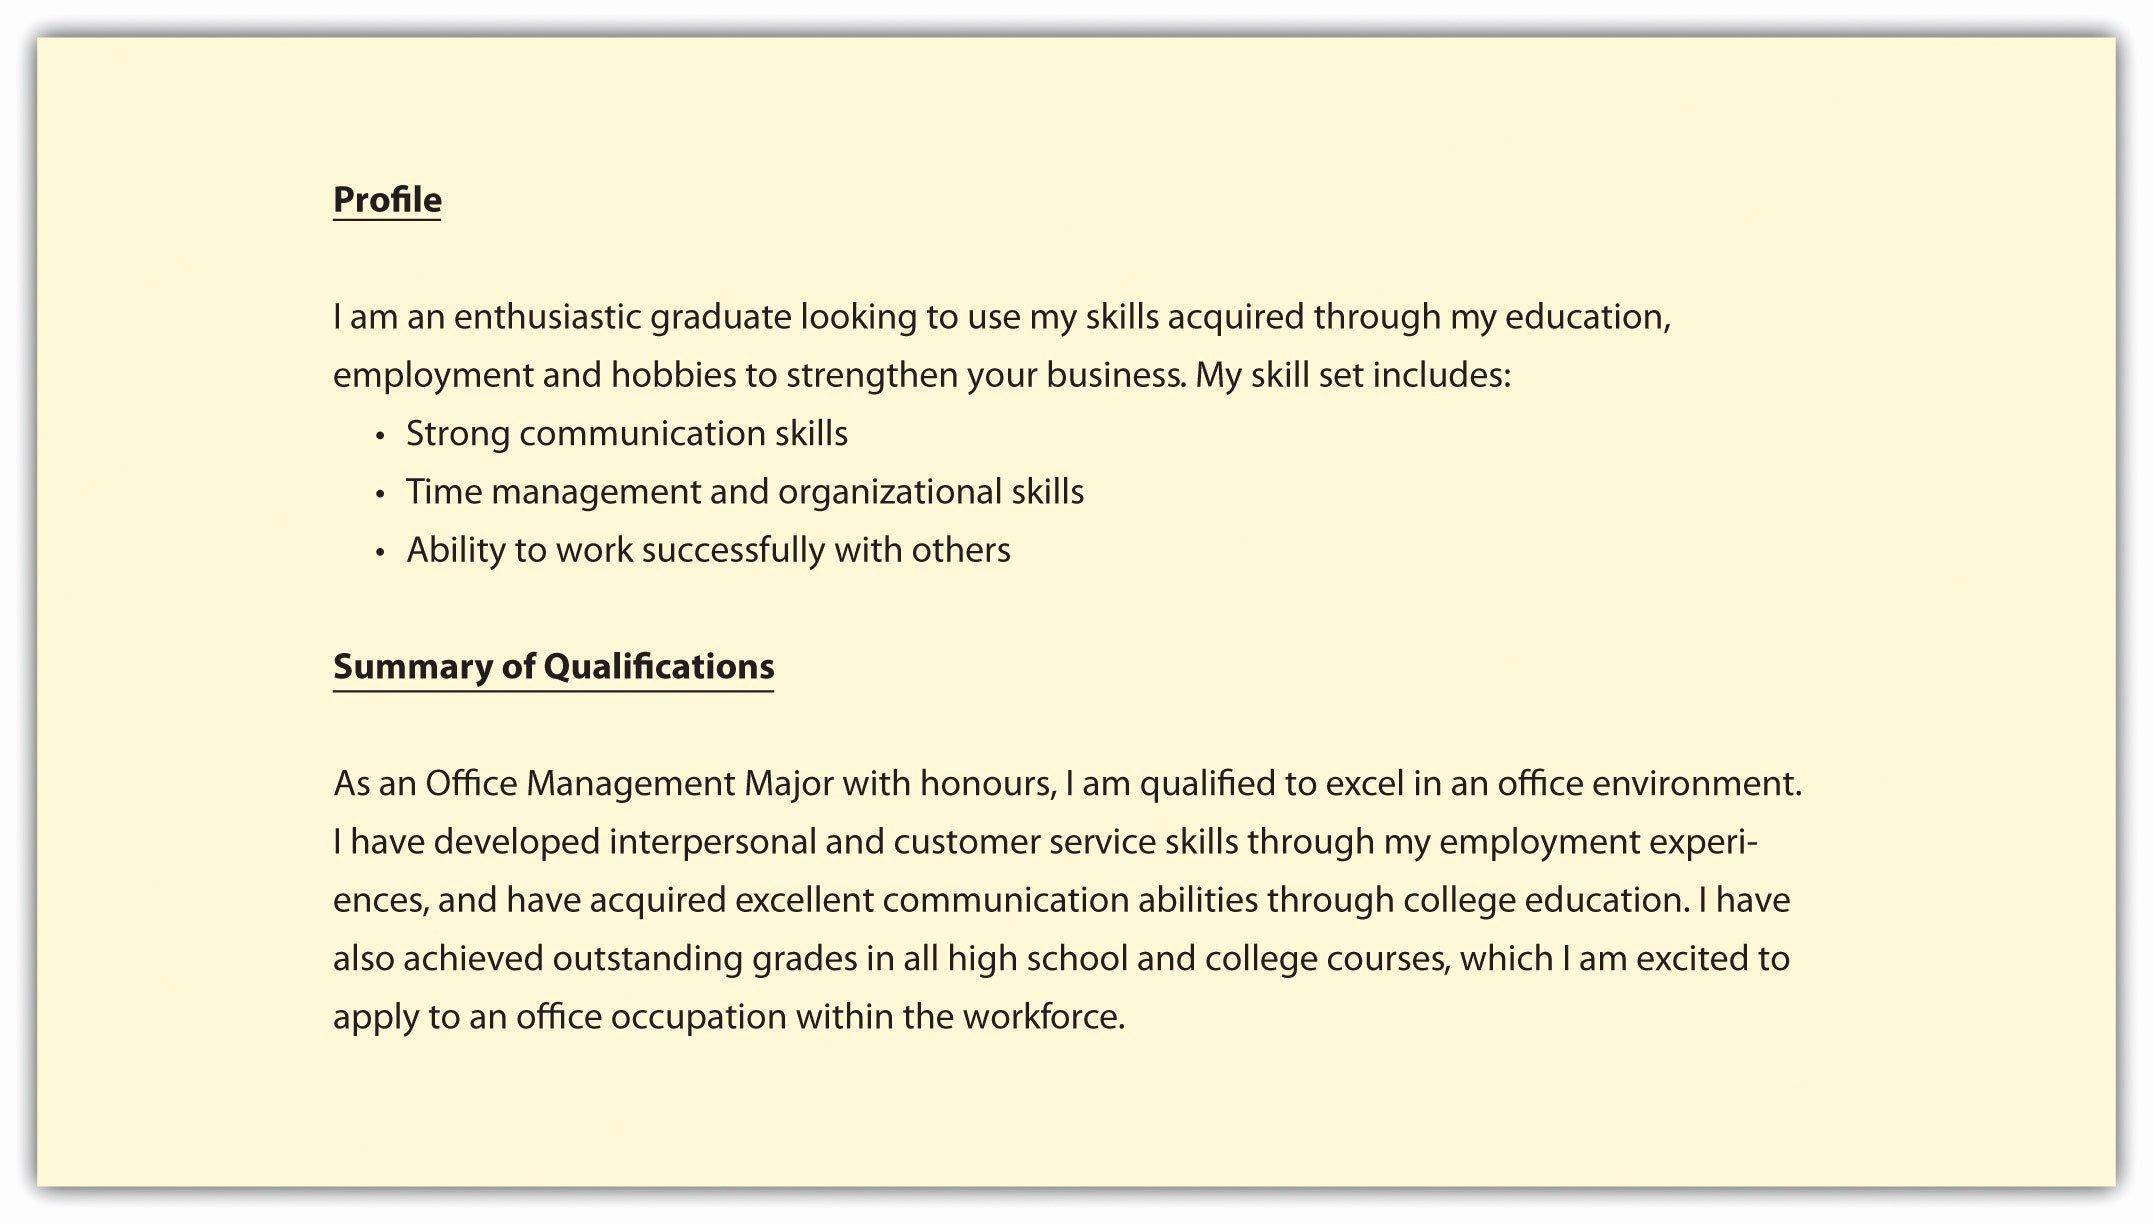 Resume Summary Section Job Sample social Worker